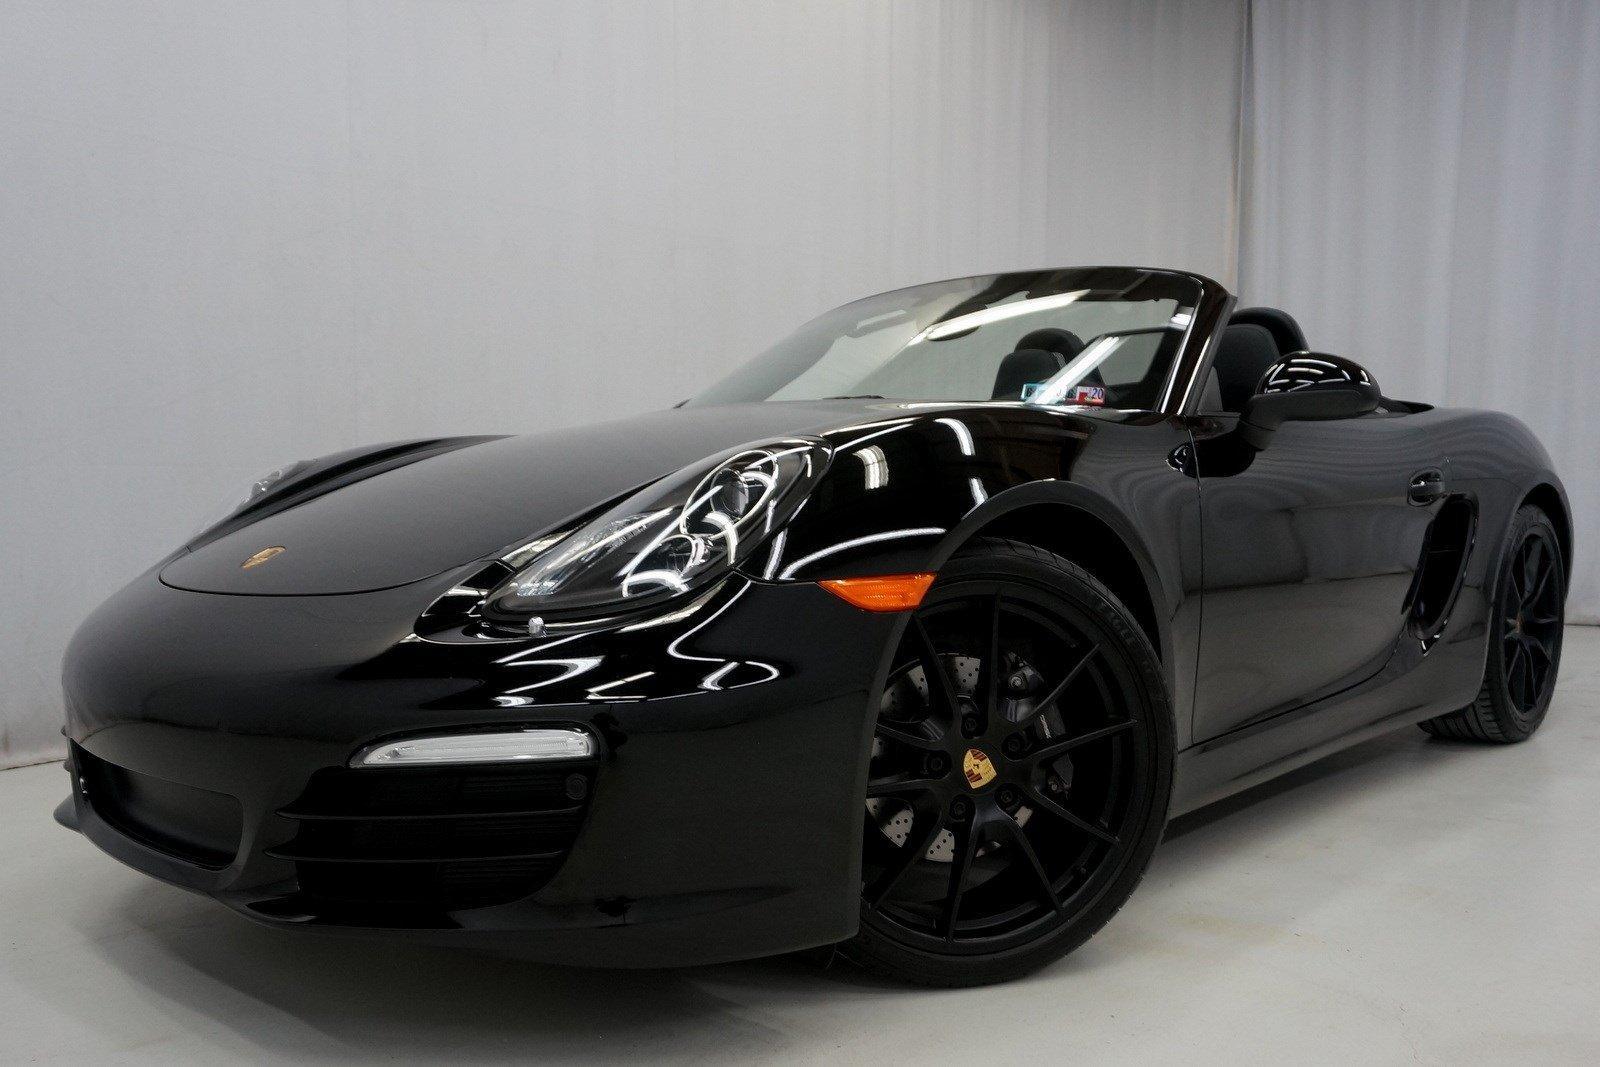 2016 Porsche Boxster Black Edition Stock S120664 For Sale Near King Of Prussia Pa Pa Porsche Dealer